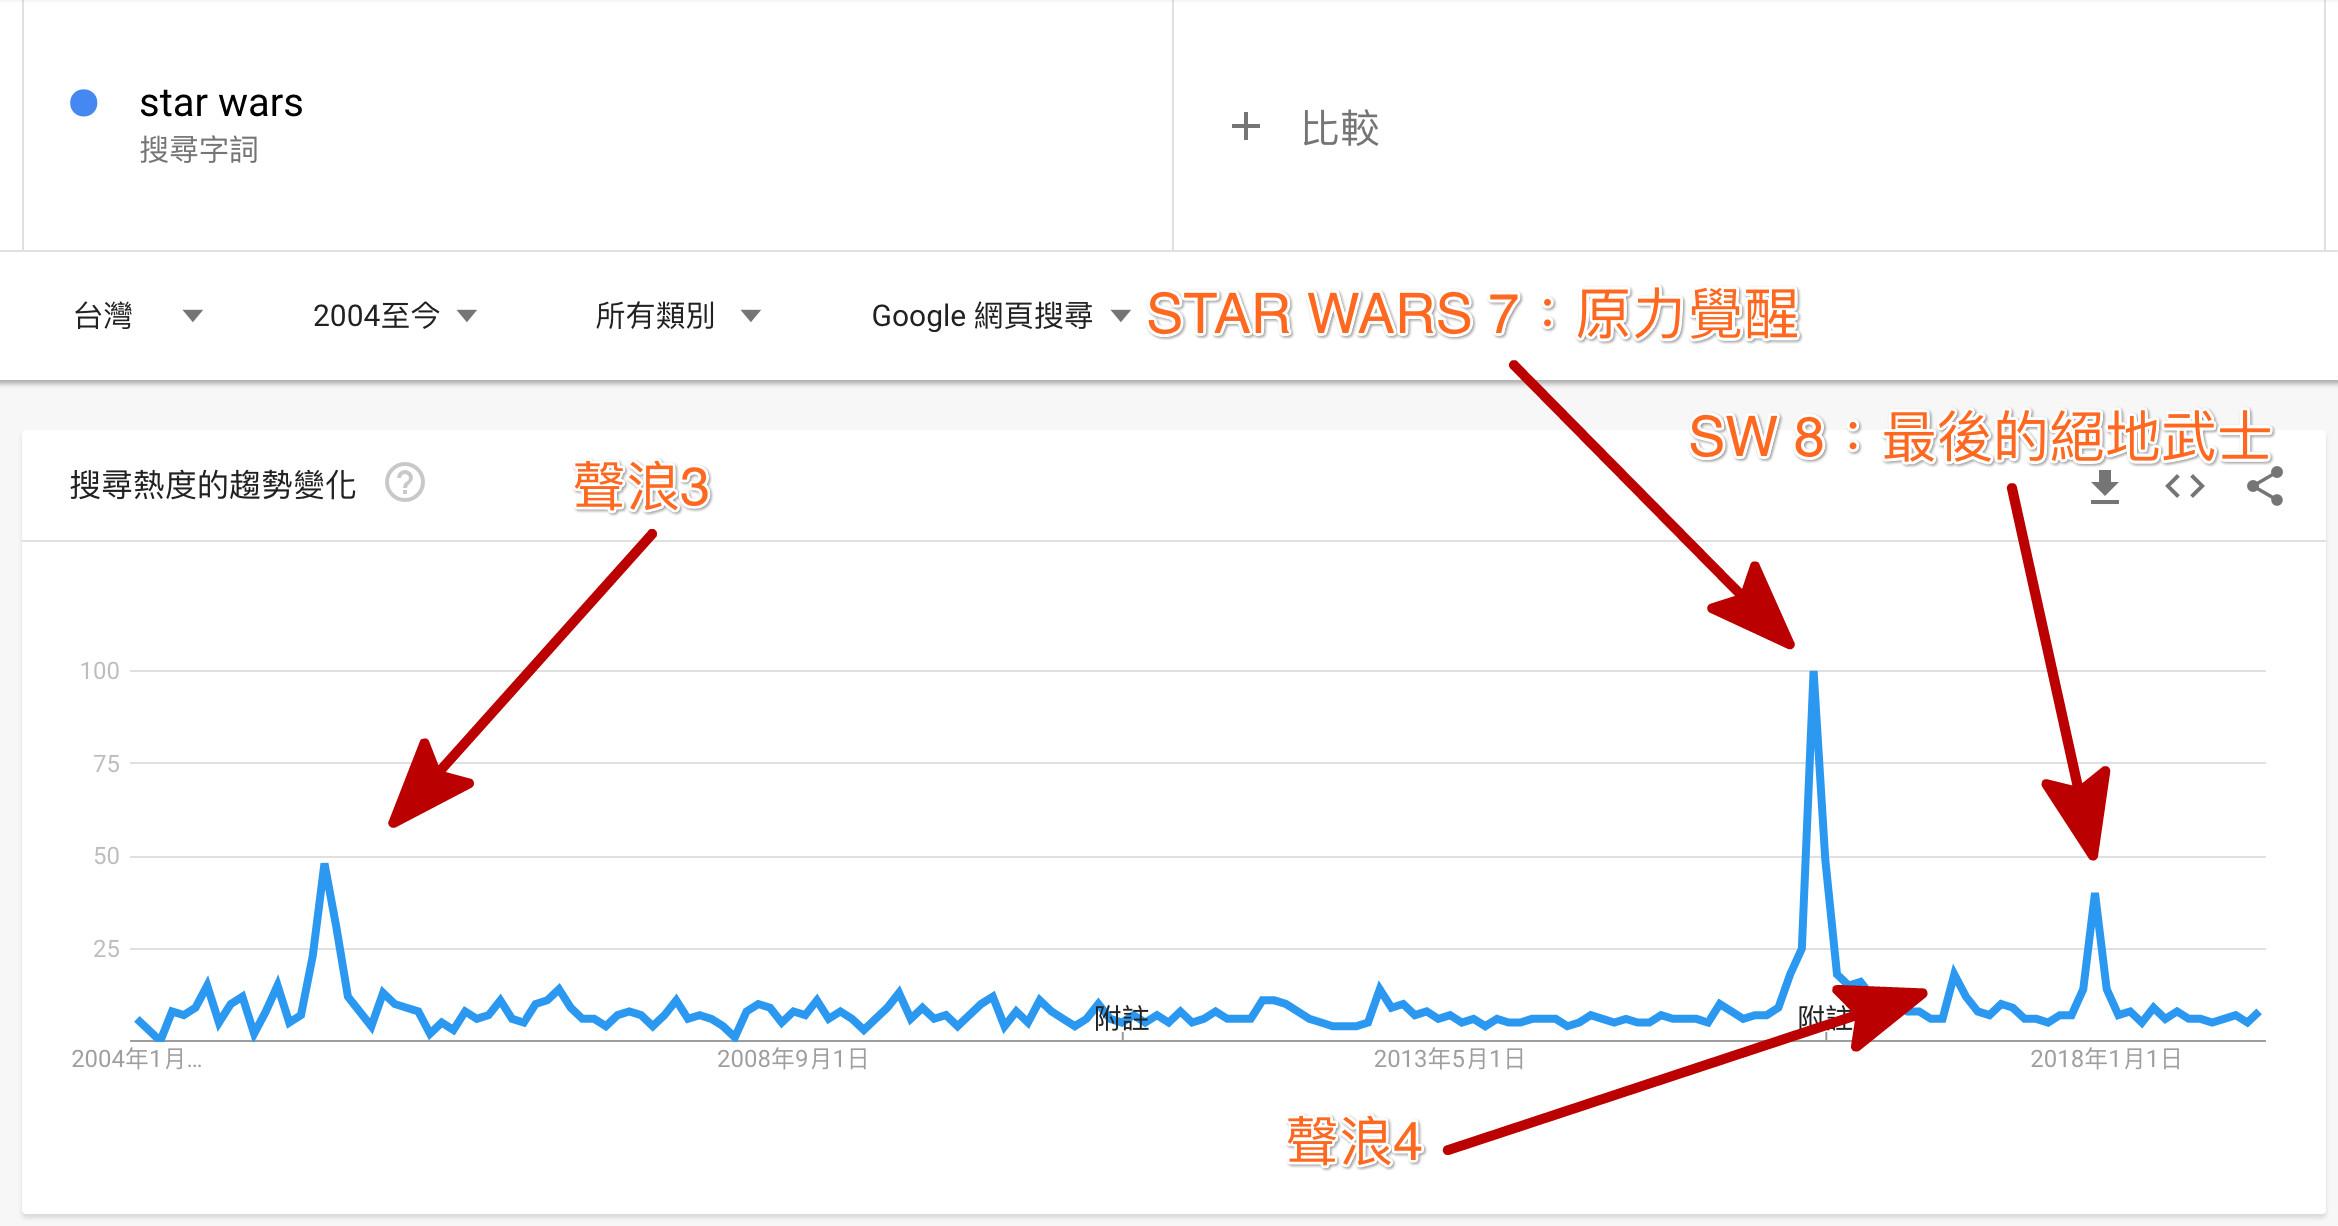 Star wars 的Google Trends的搜尋量